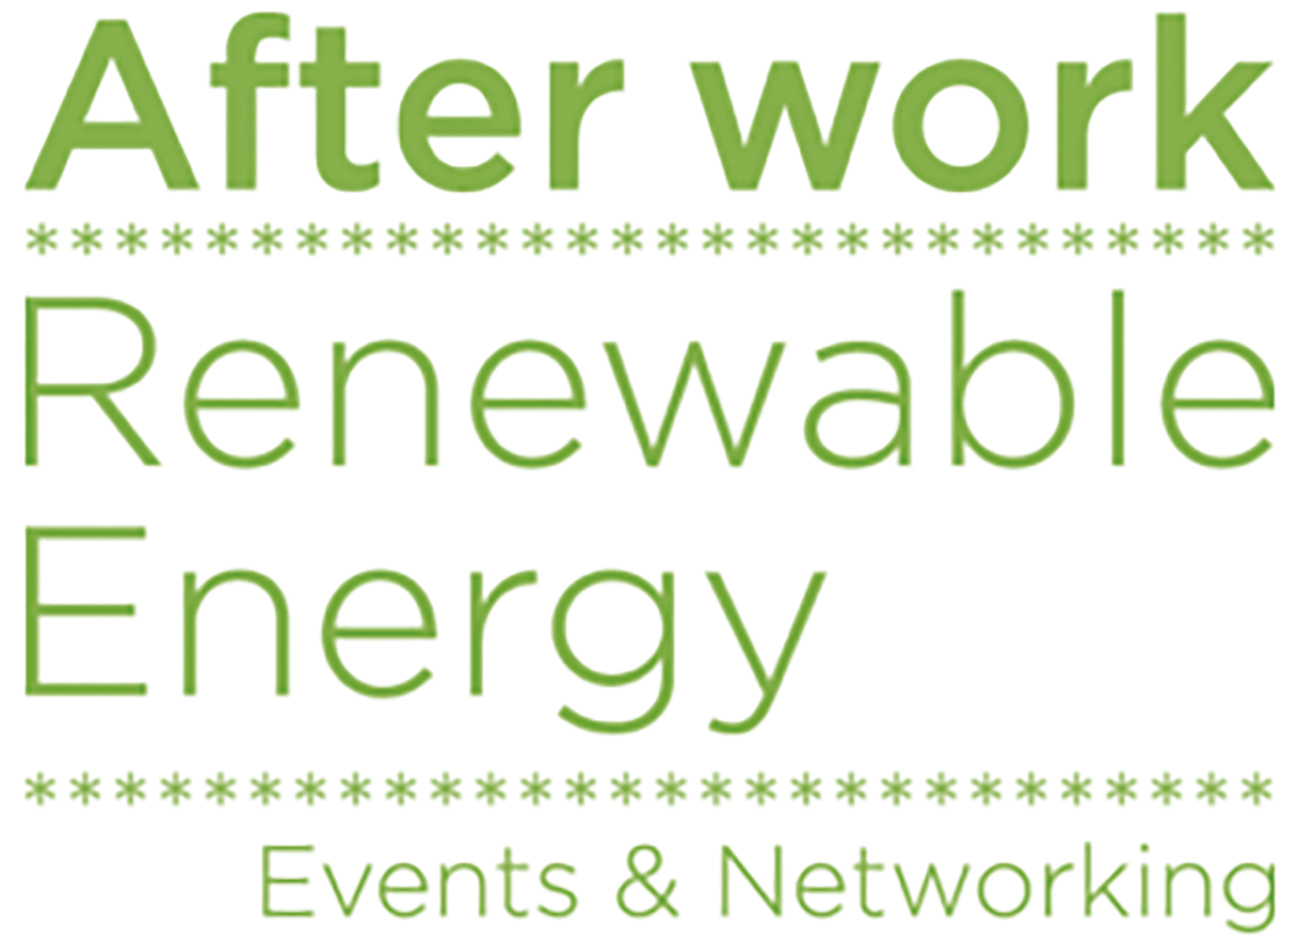 After work Énergies renouvelables